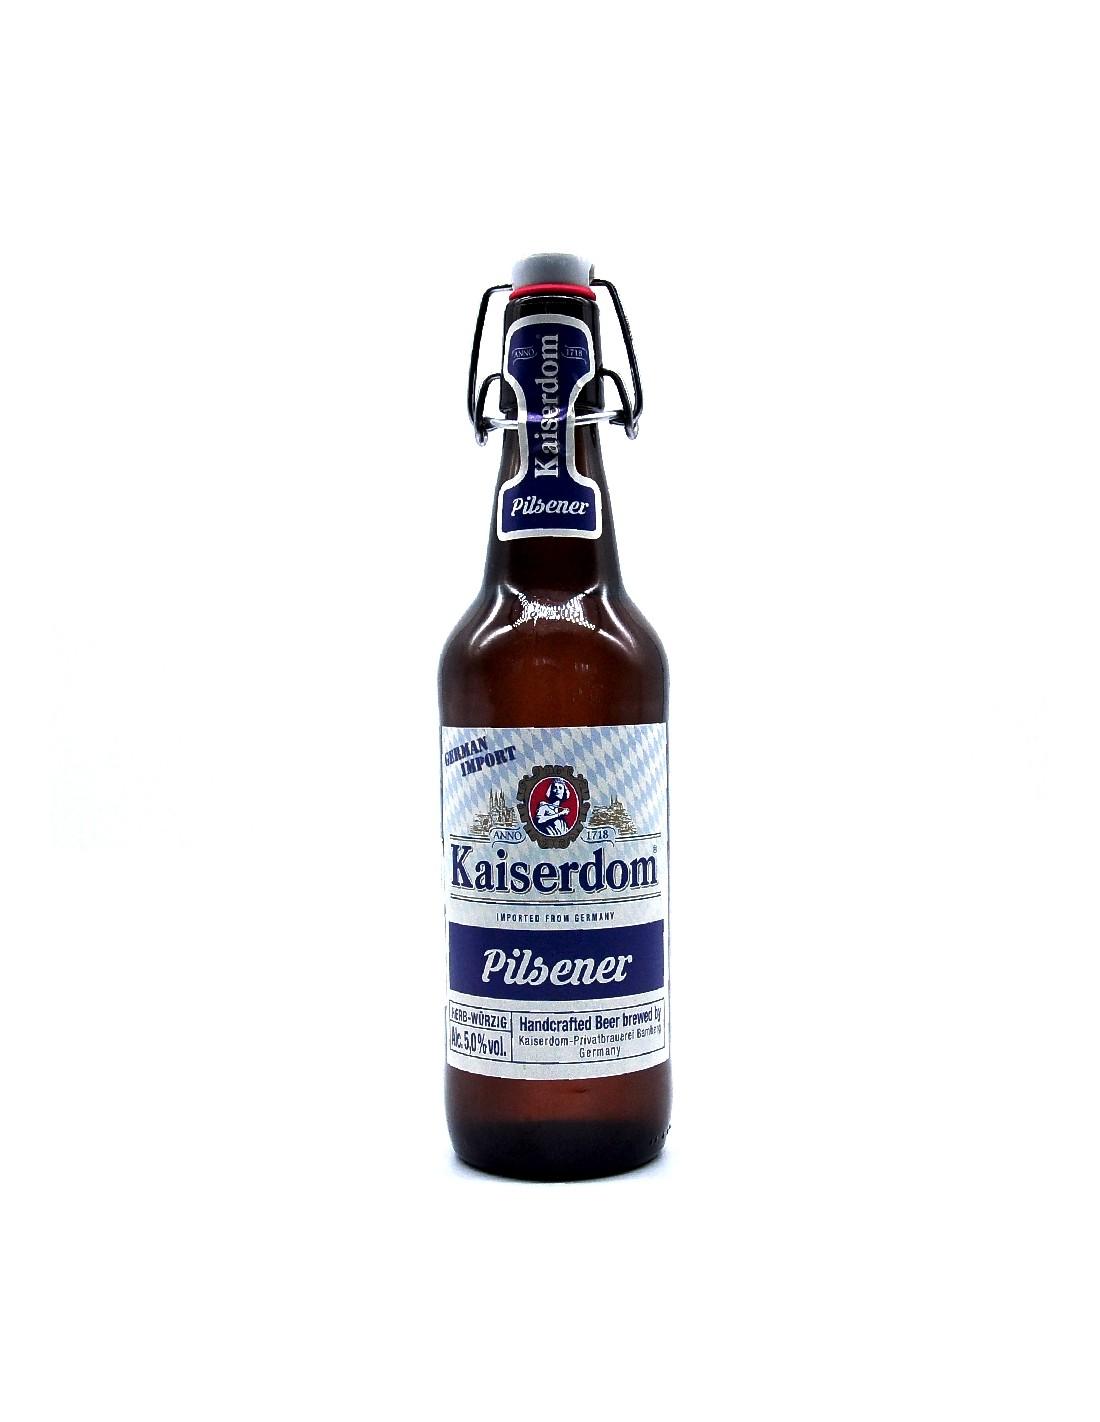 Bere blonda pilsner, Kaiserdom, 5% alc., 0.5L, Germania, sticla